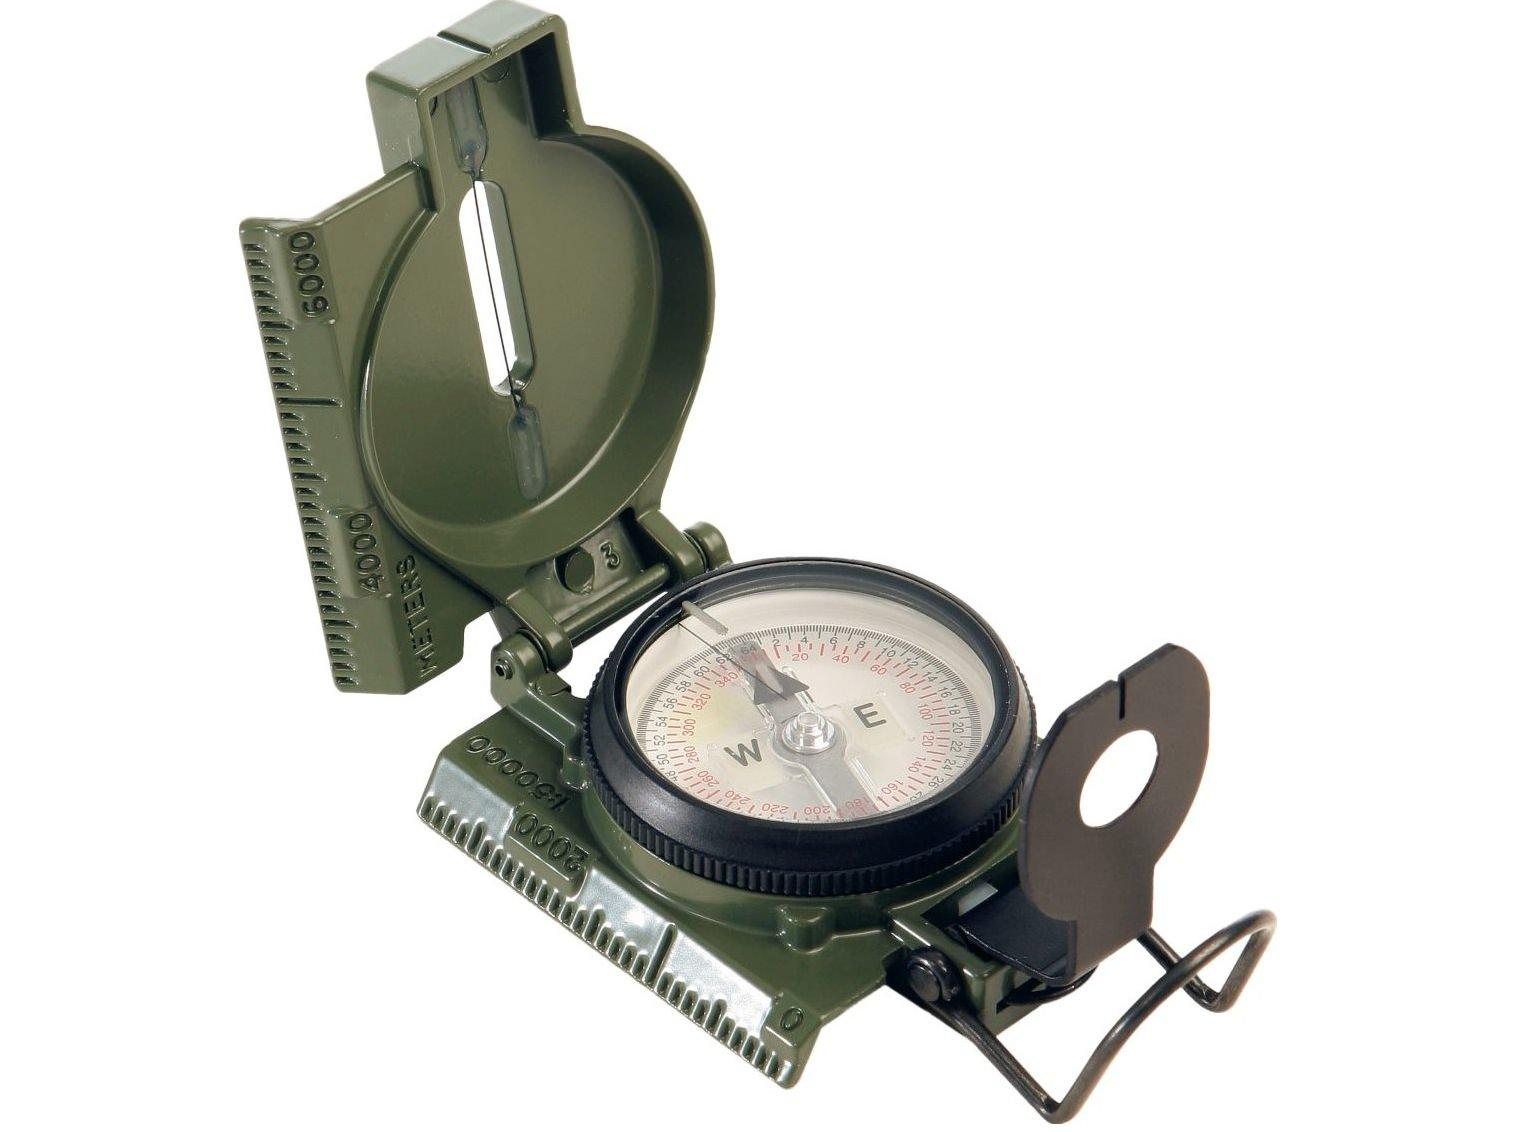 Cammenga Phosphorescent Compass